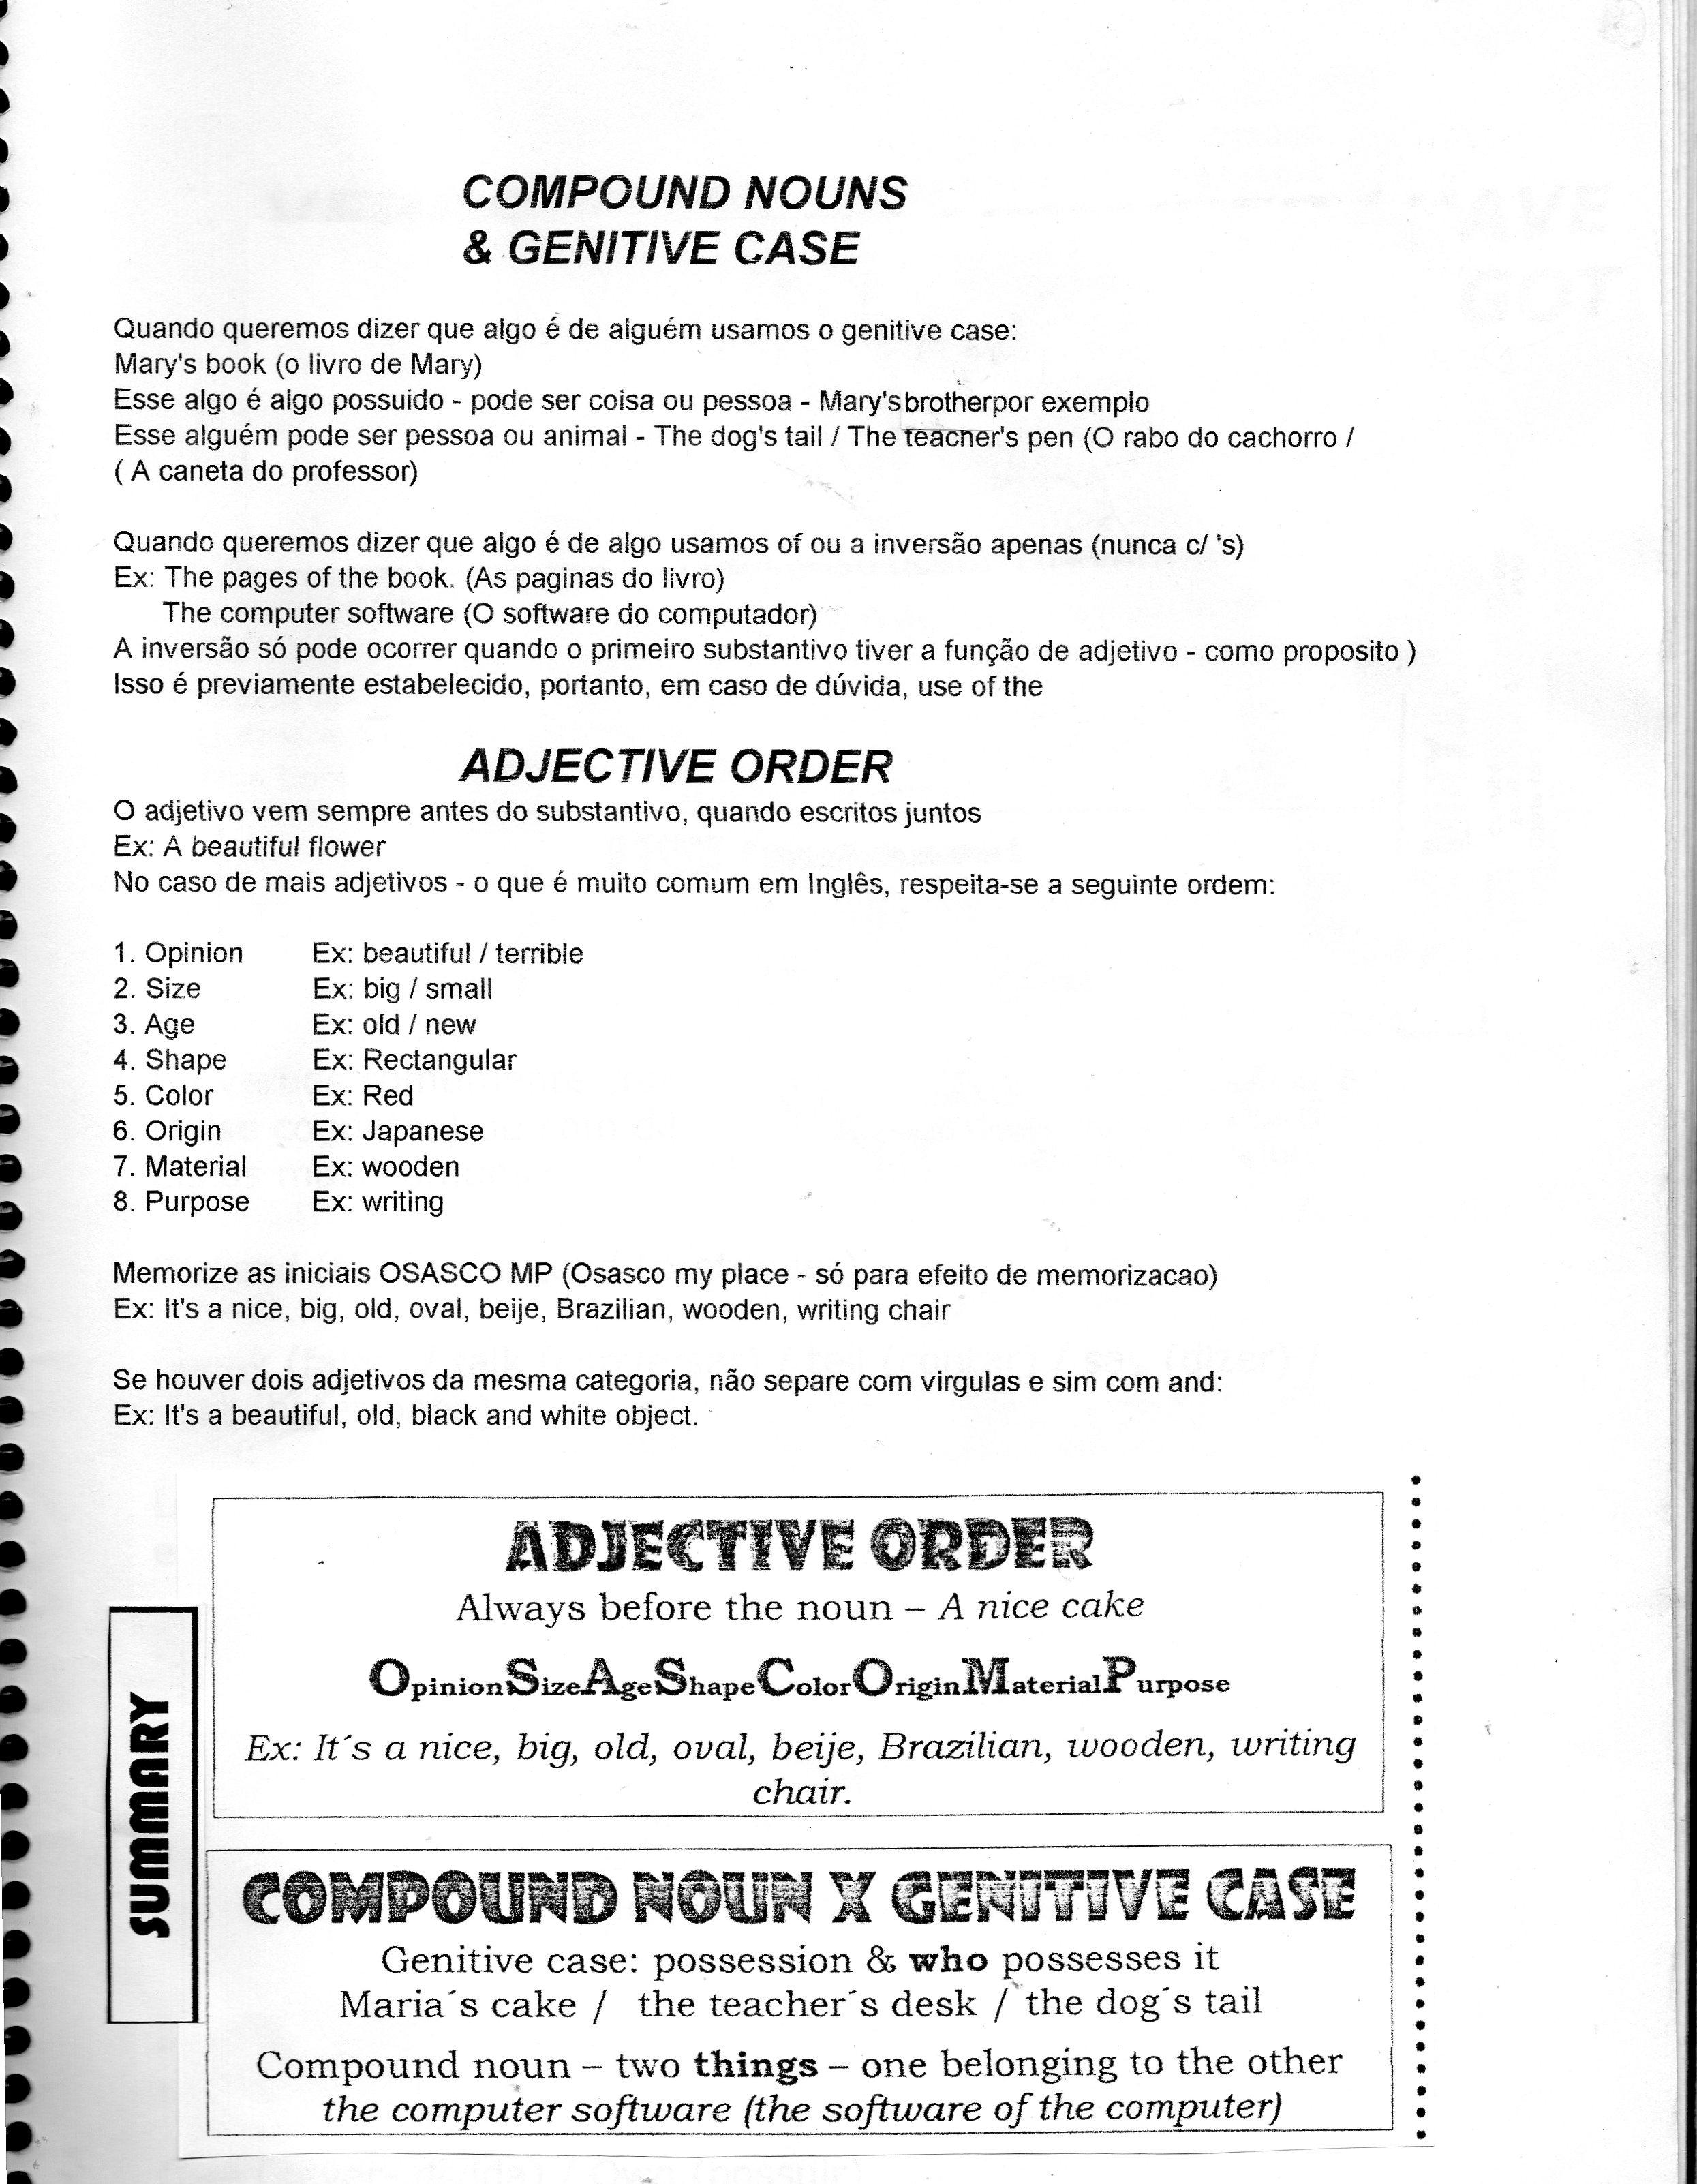 sc 1 st  vivienglishteacher - WordPress.com & 27 compound nouns u0026 genitive case   vivienglishteacher